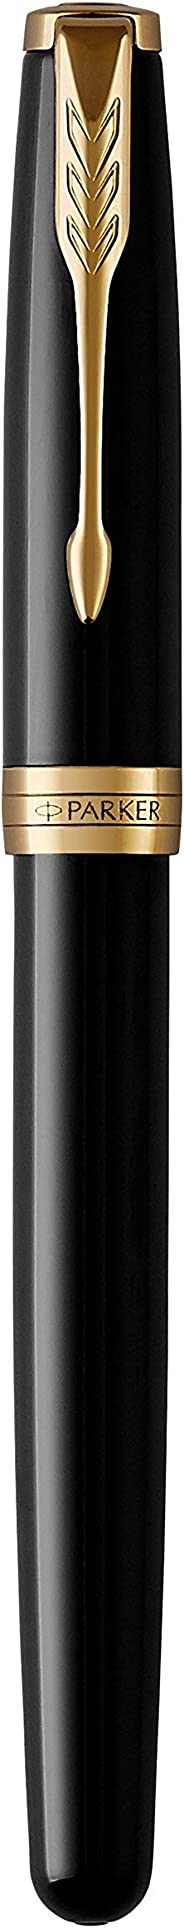 PARKER 派克 Sonnet Fountain 钢笔,金饰黑色漆,实心18k金中号笔尖